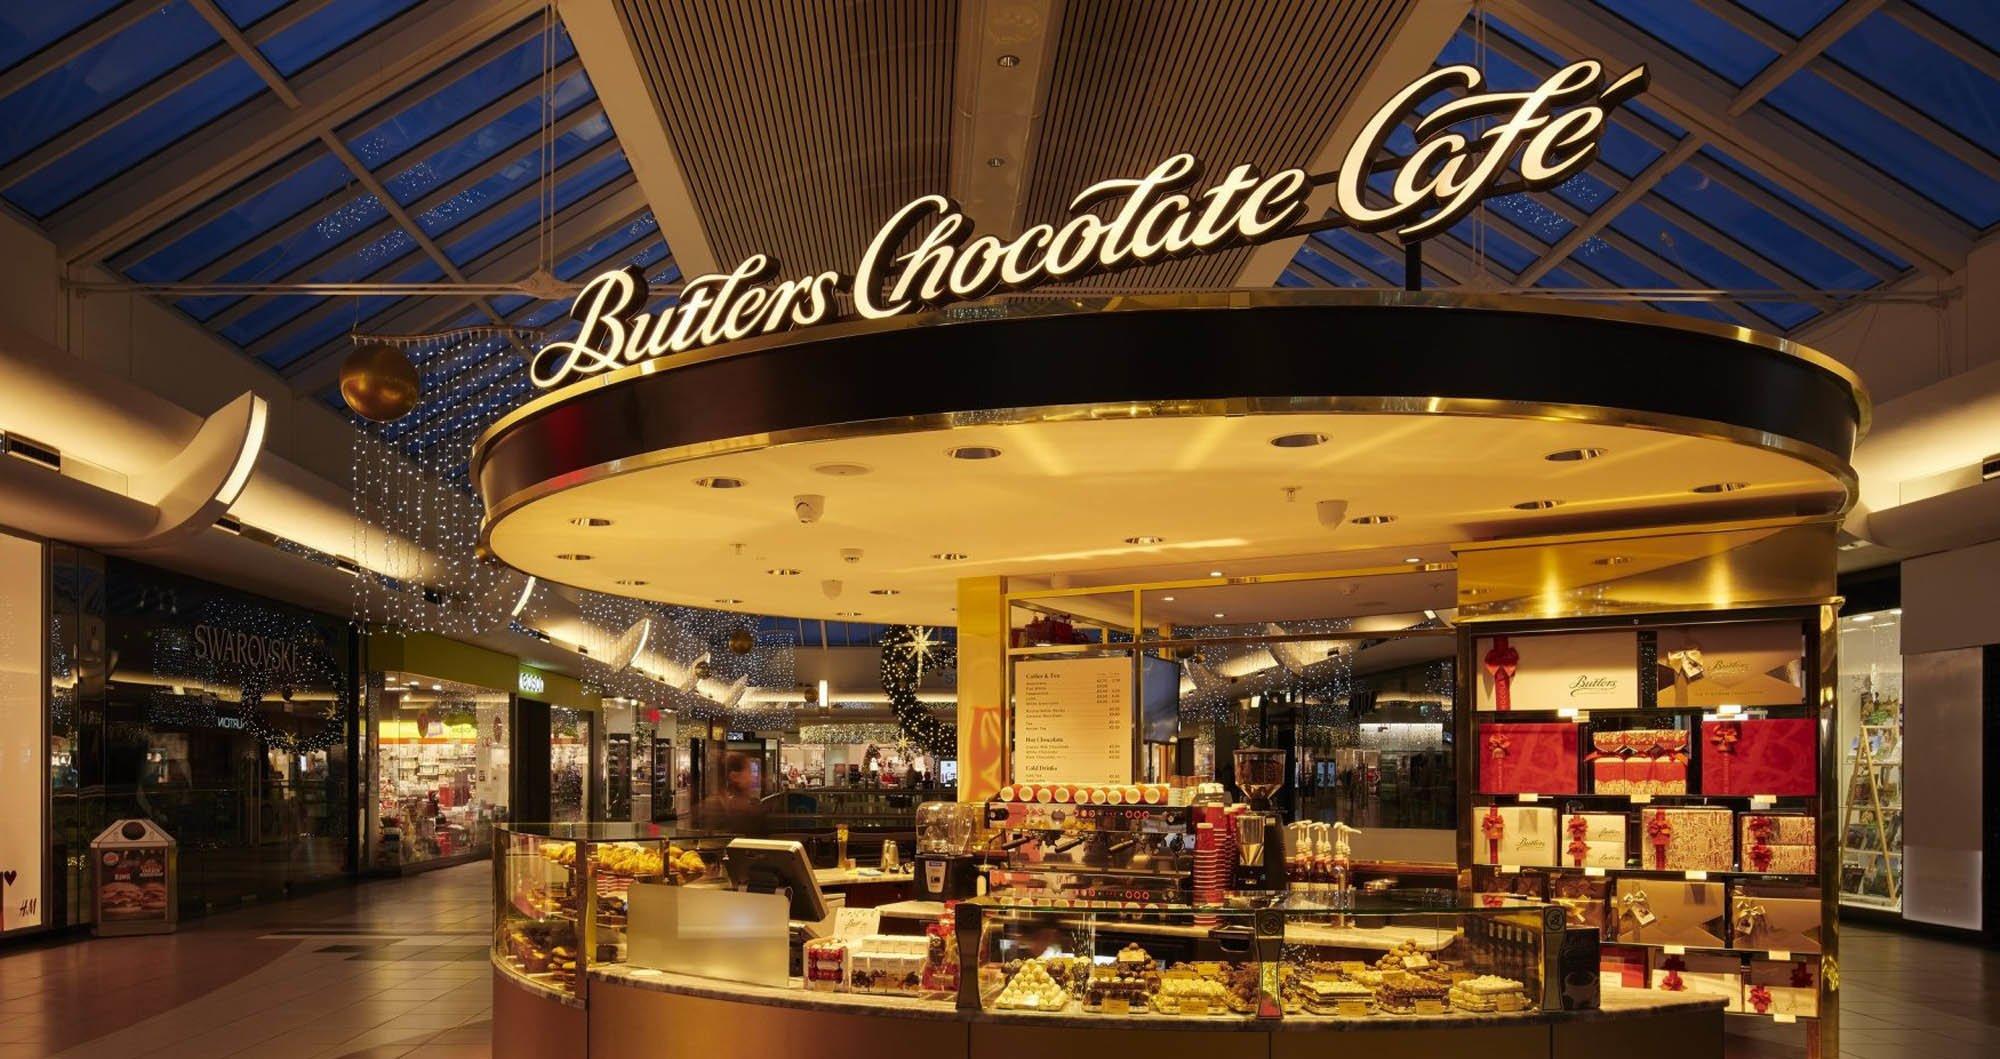 Butlers Chocolate Café Kiosk @ Blanchardstown Centre